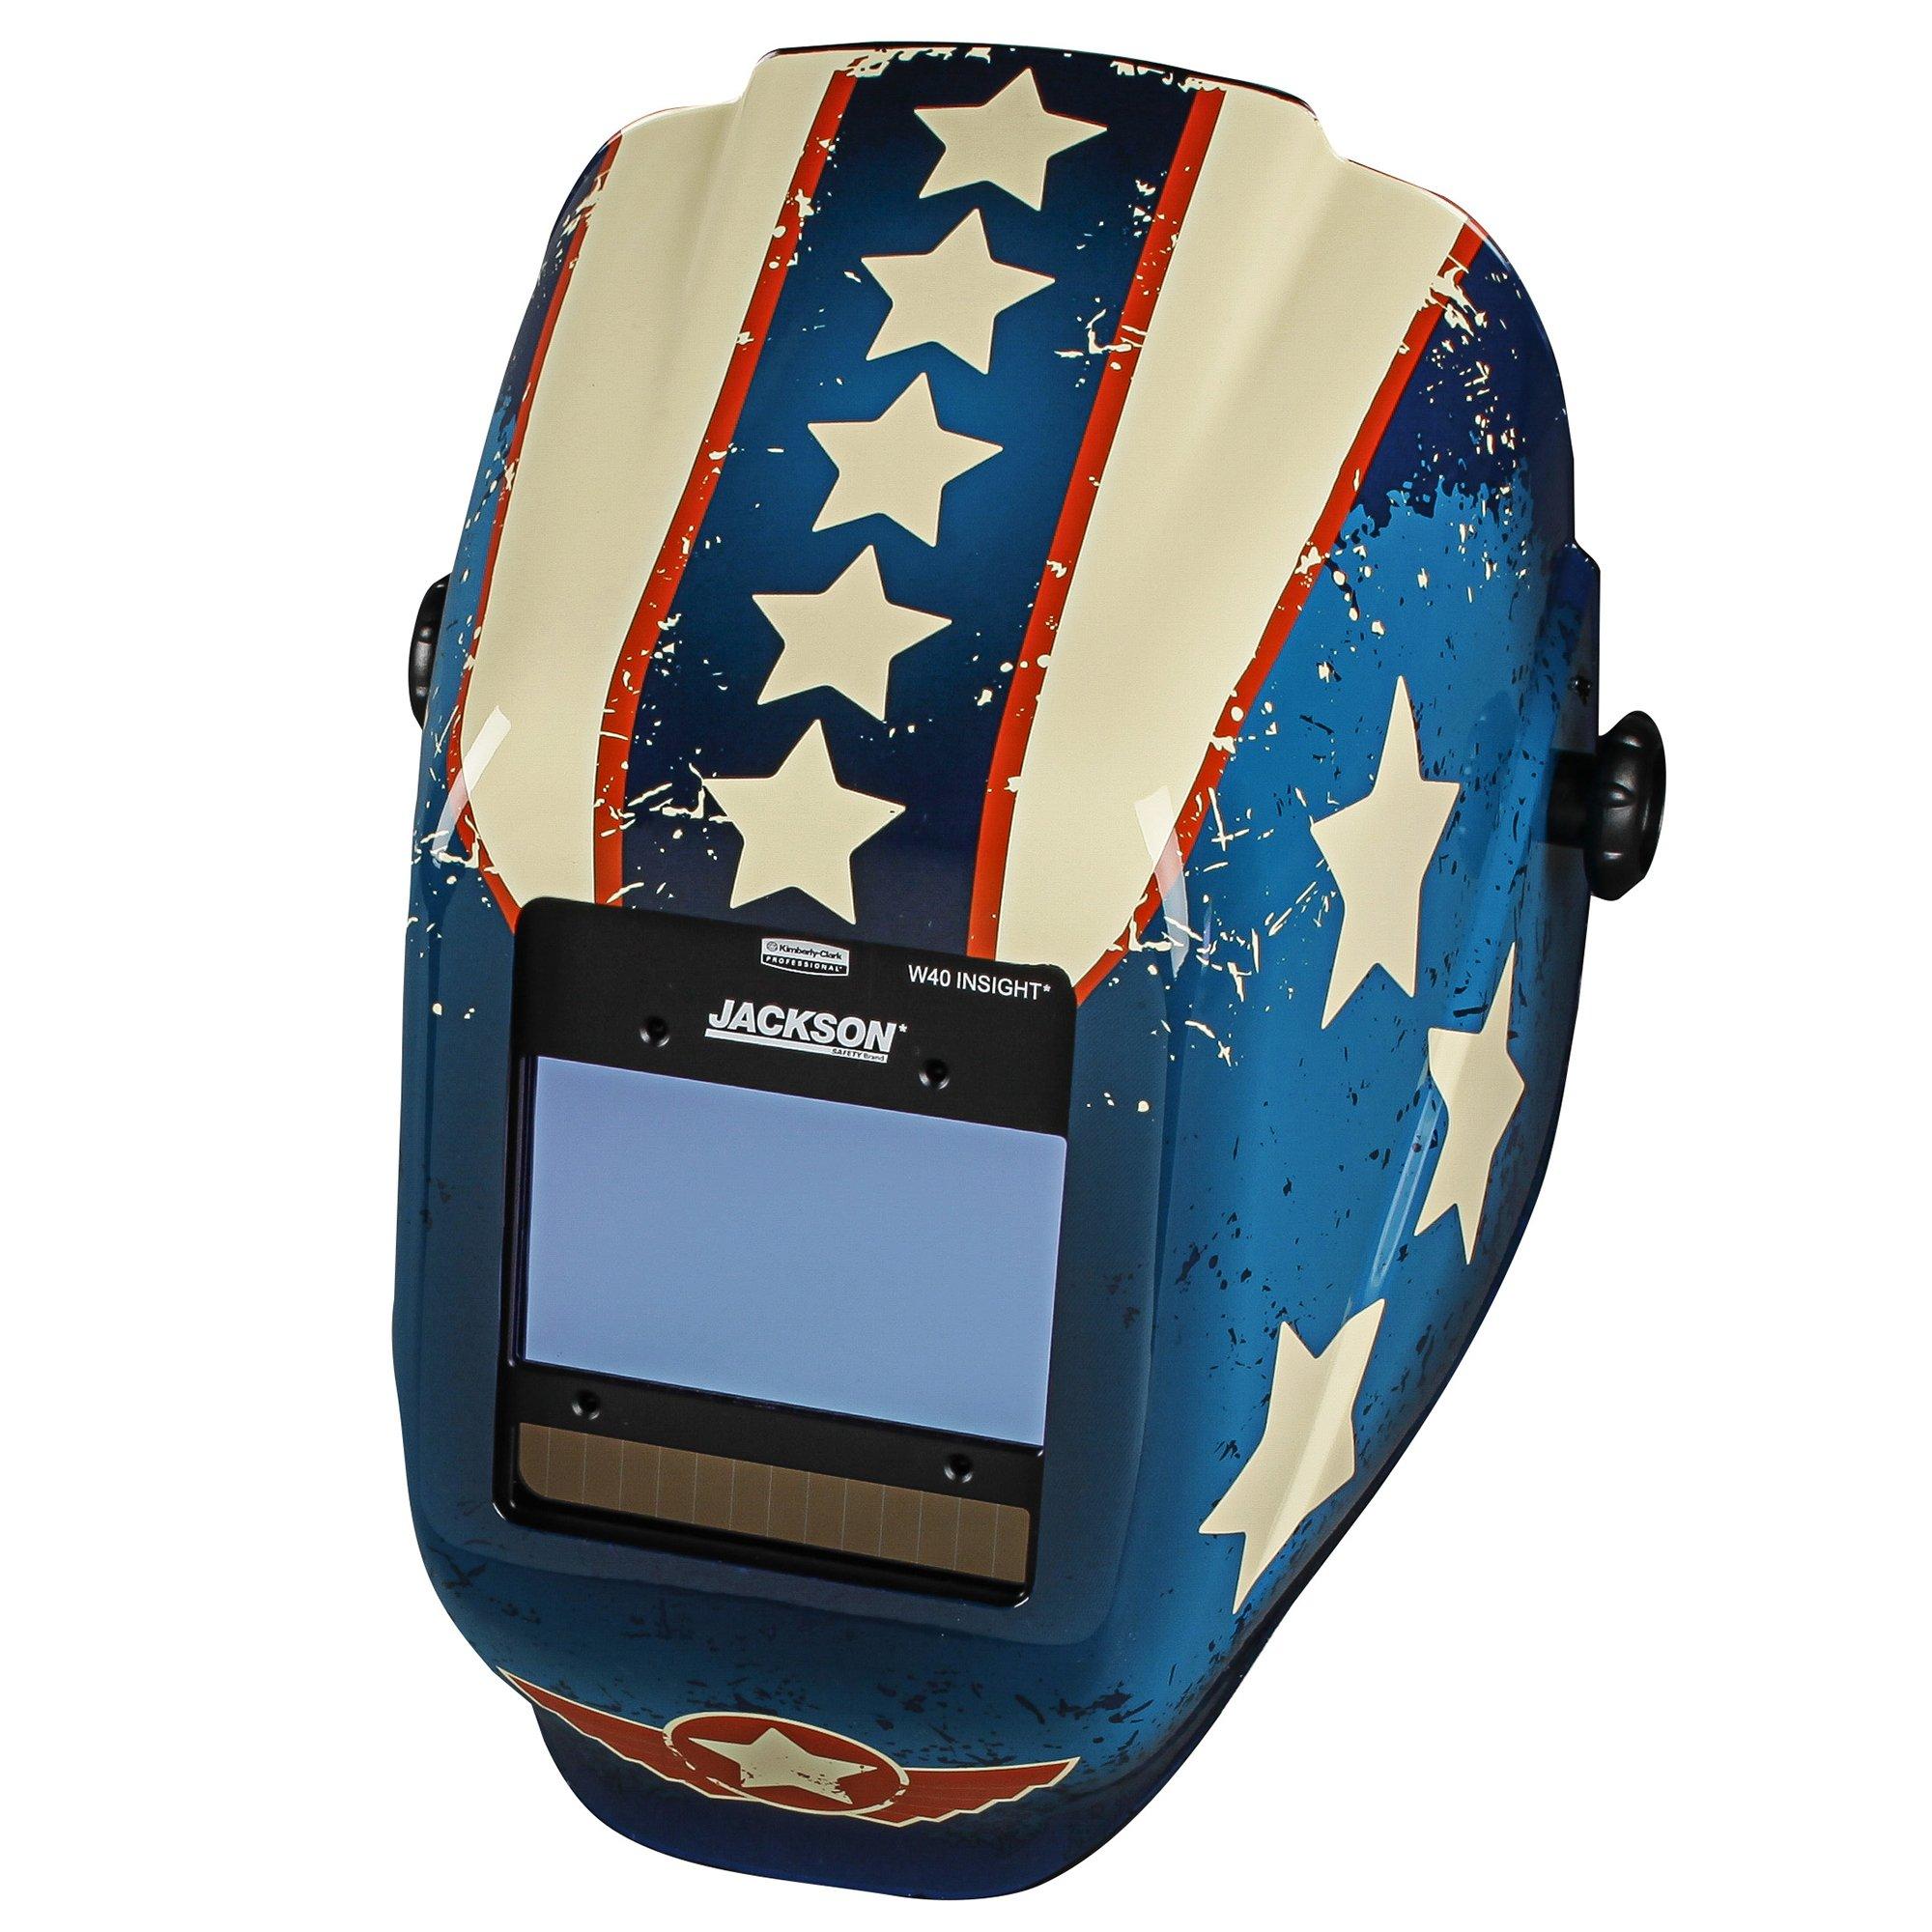 Jackson Safety Insight Variable Auto Darkening Welding Helmet (46101), HLX, 370 Comfortable Headgear, Ultra-Light Shell, Stars & Scars, 1 Helmet by Jackson Safety (Image #5)